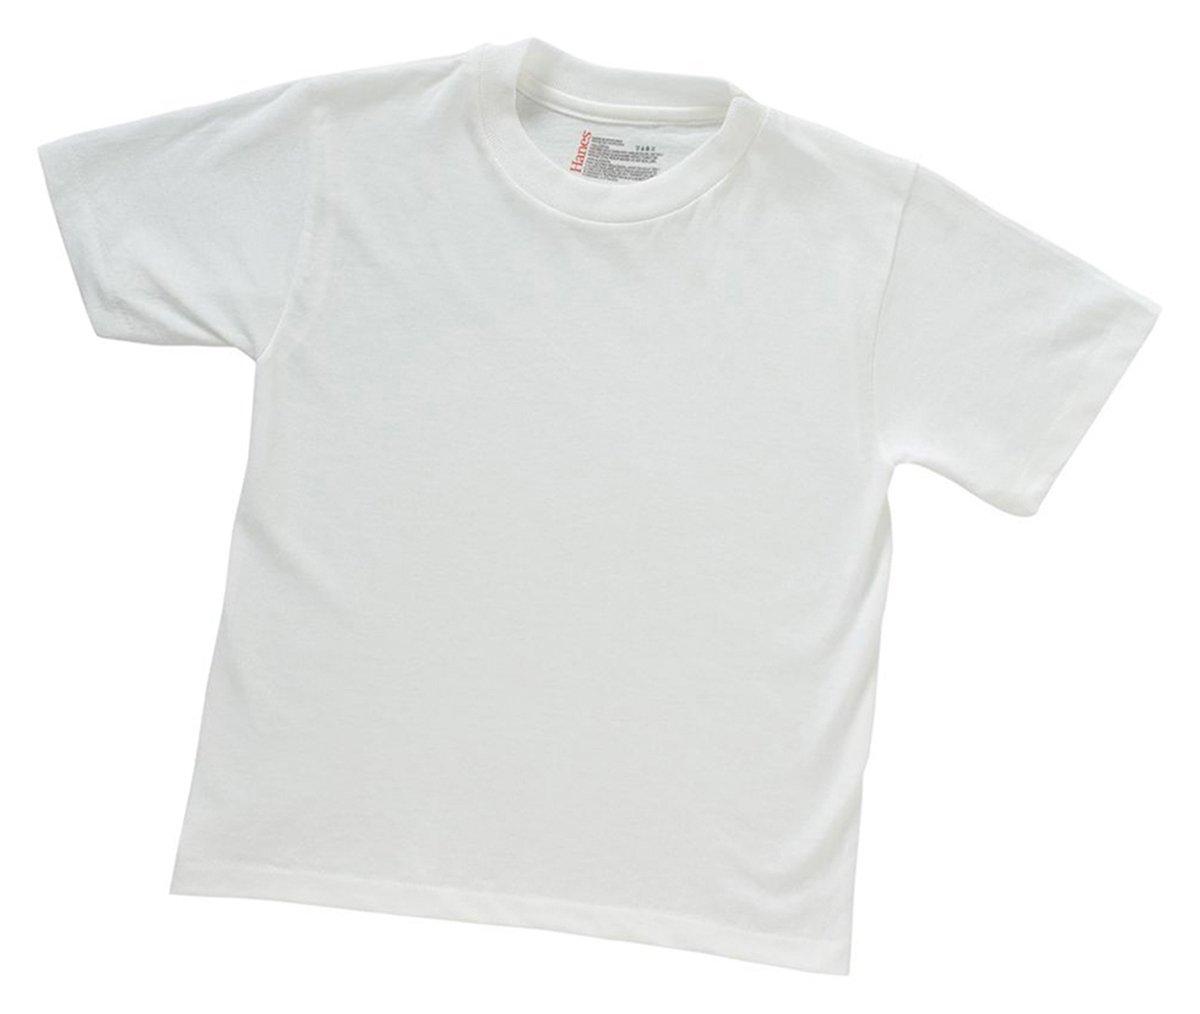 Hanes ComfortSoft Tagless Boys Crewneck T-Shirt 3-Pack B2138